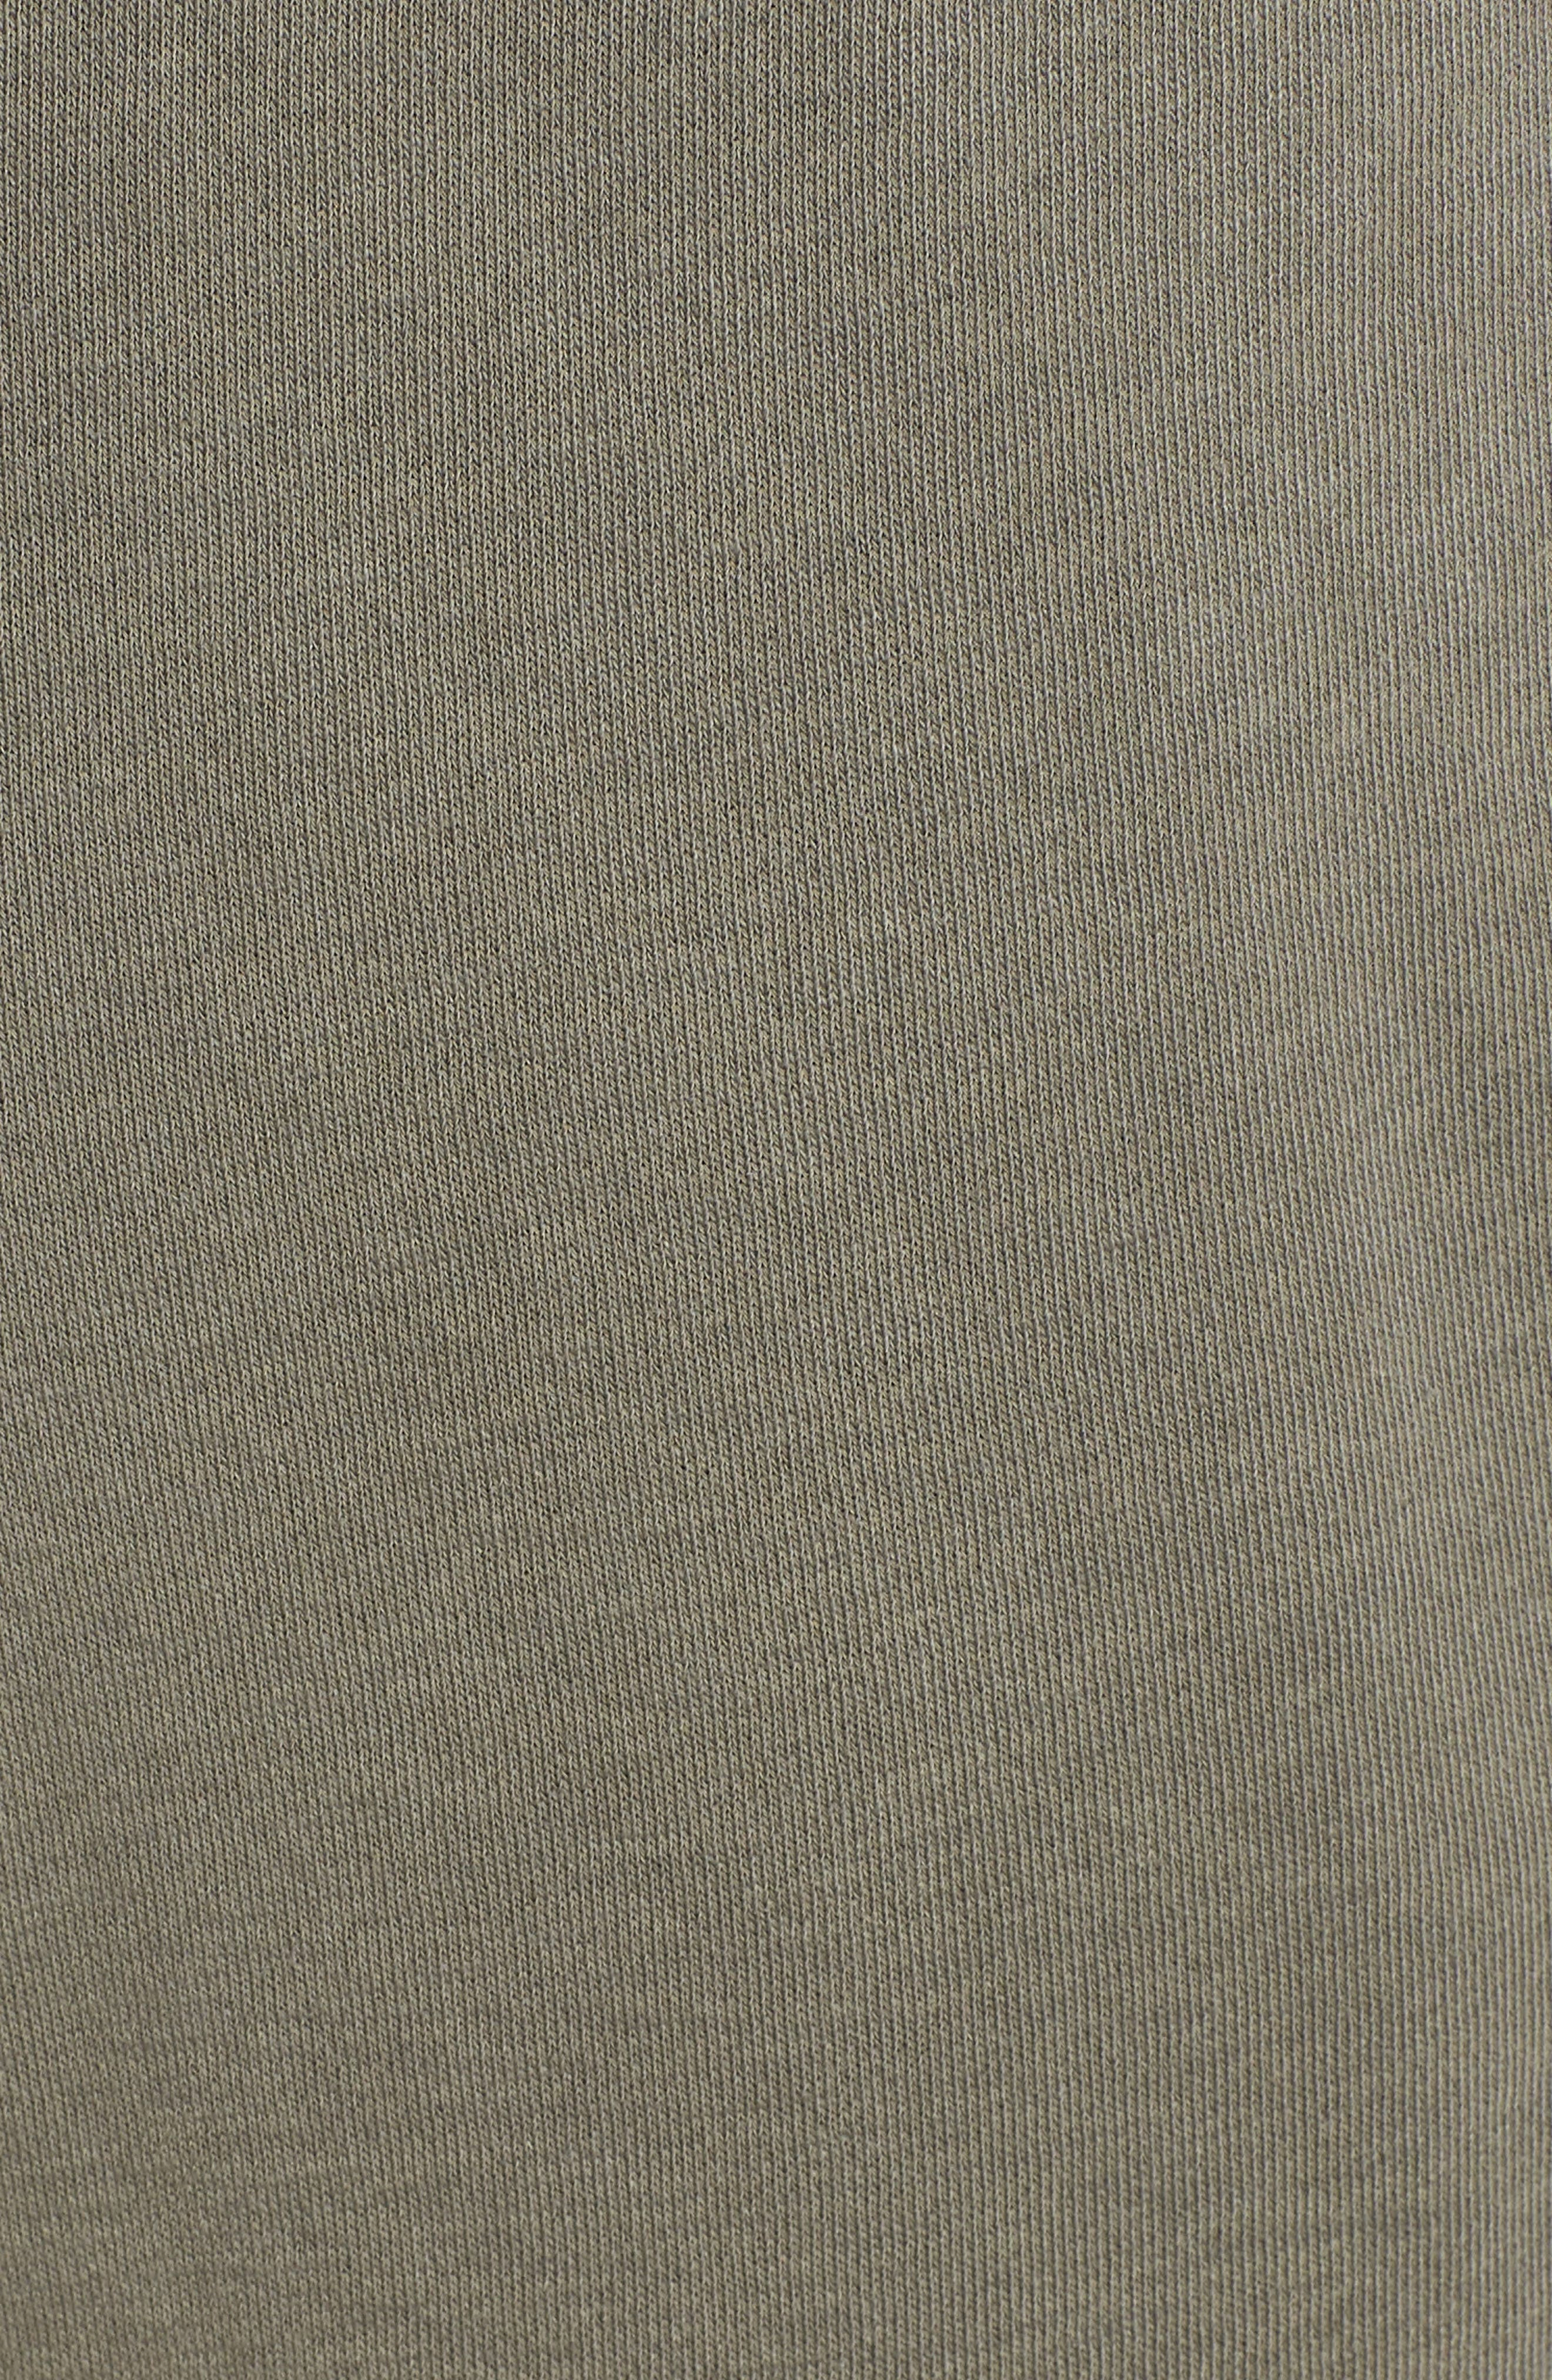 'Classic' Sweatpants,                             Alternate thumbnail 5, color,                             025